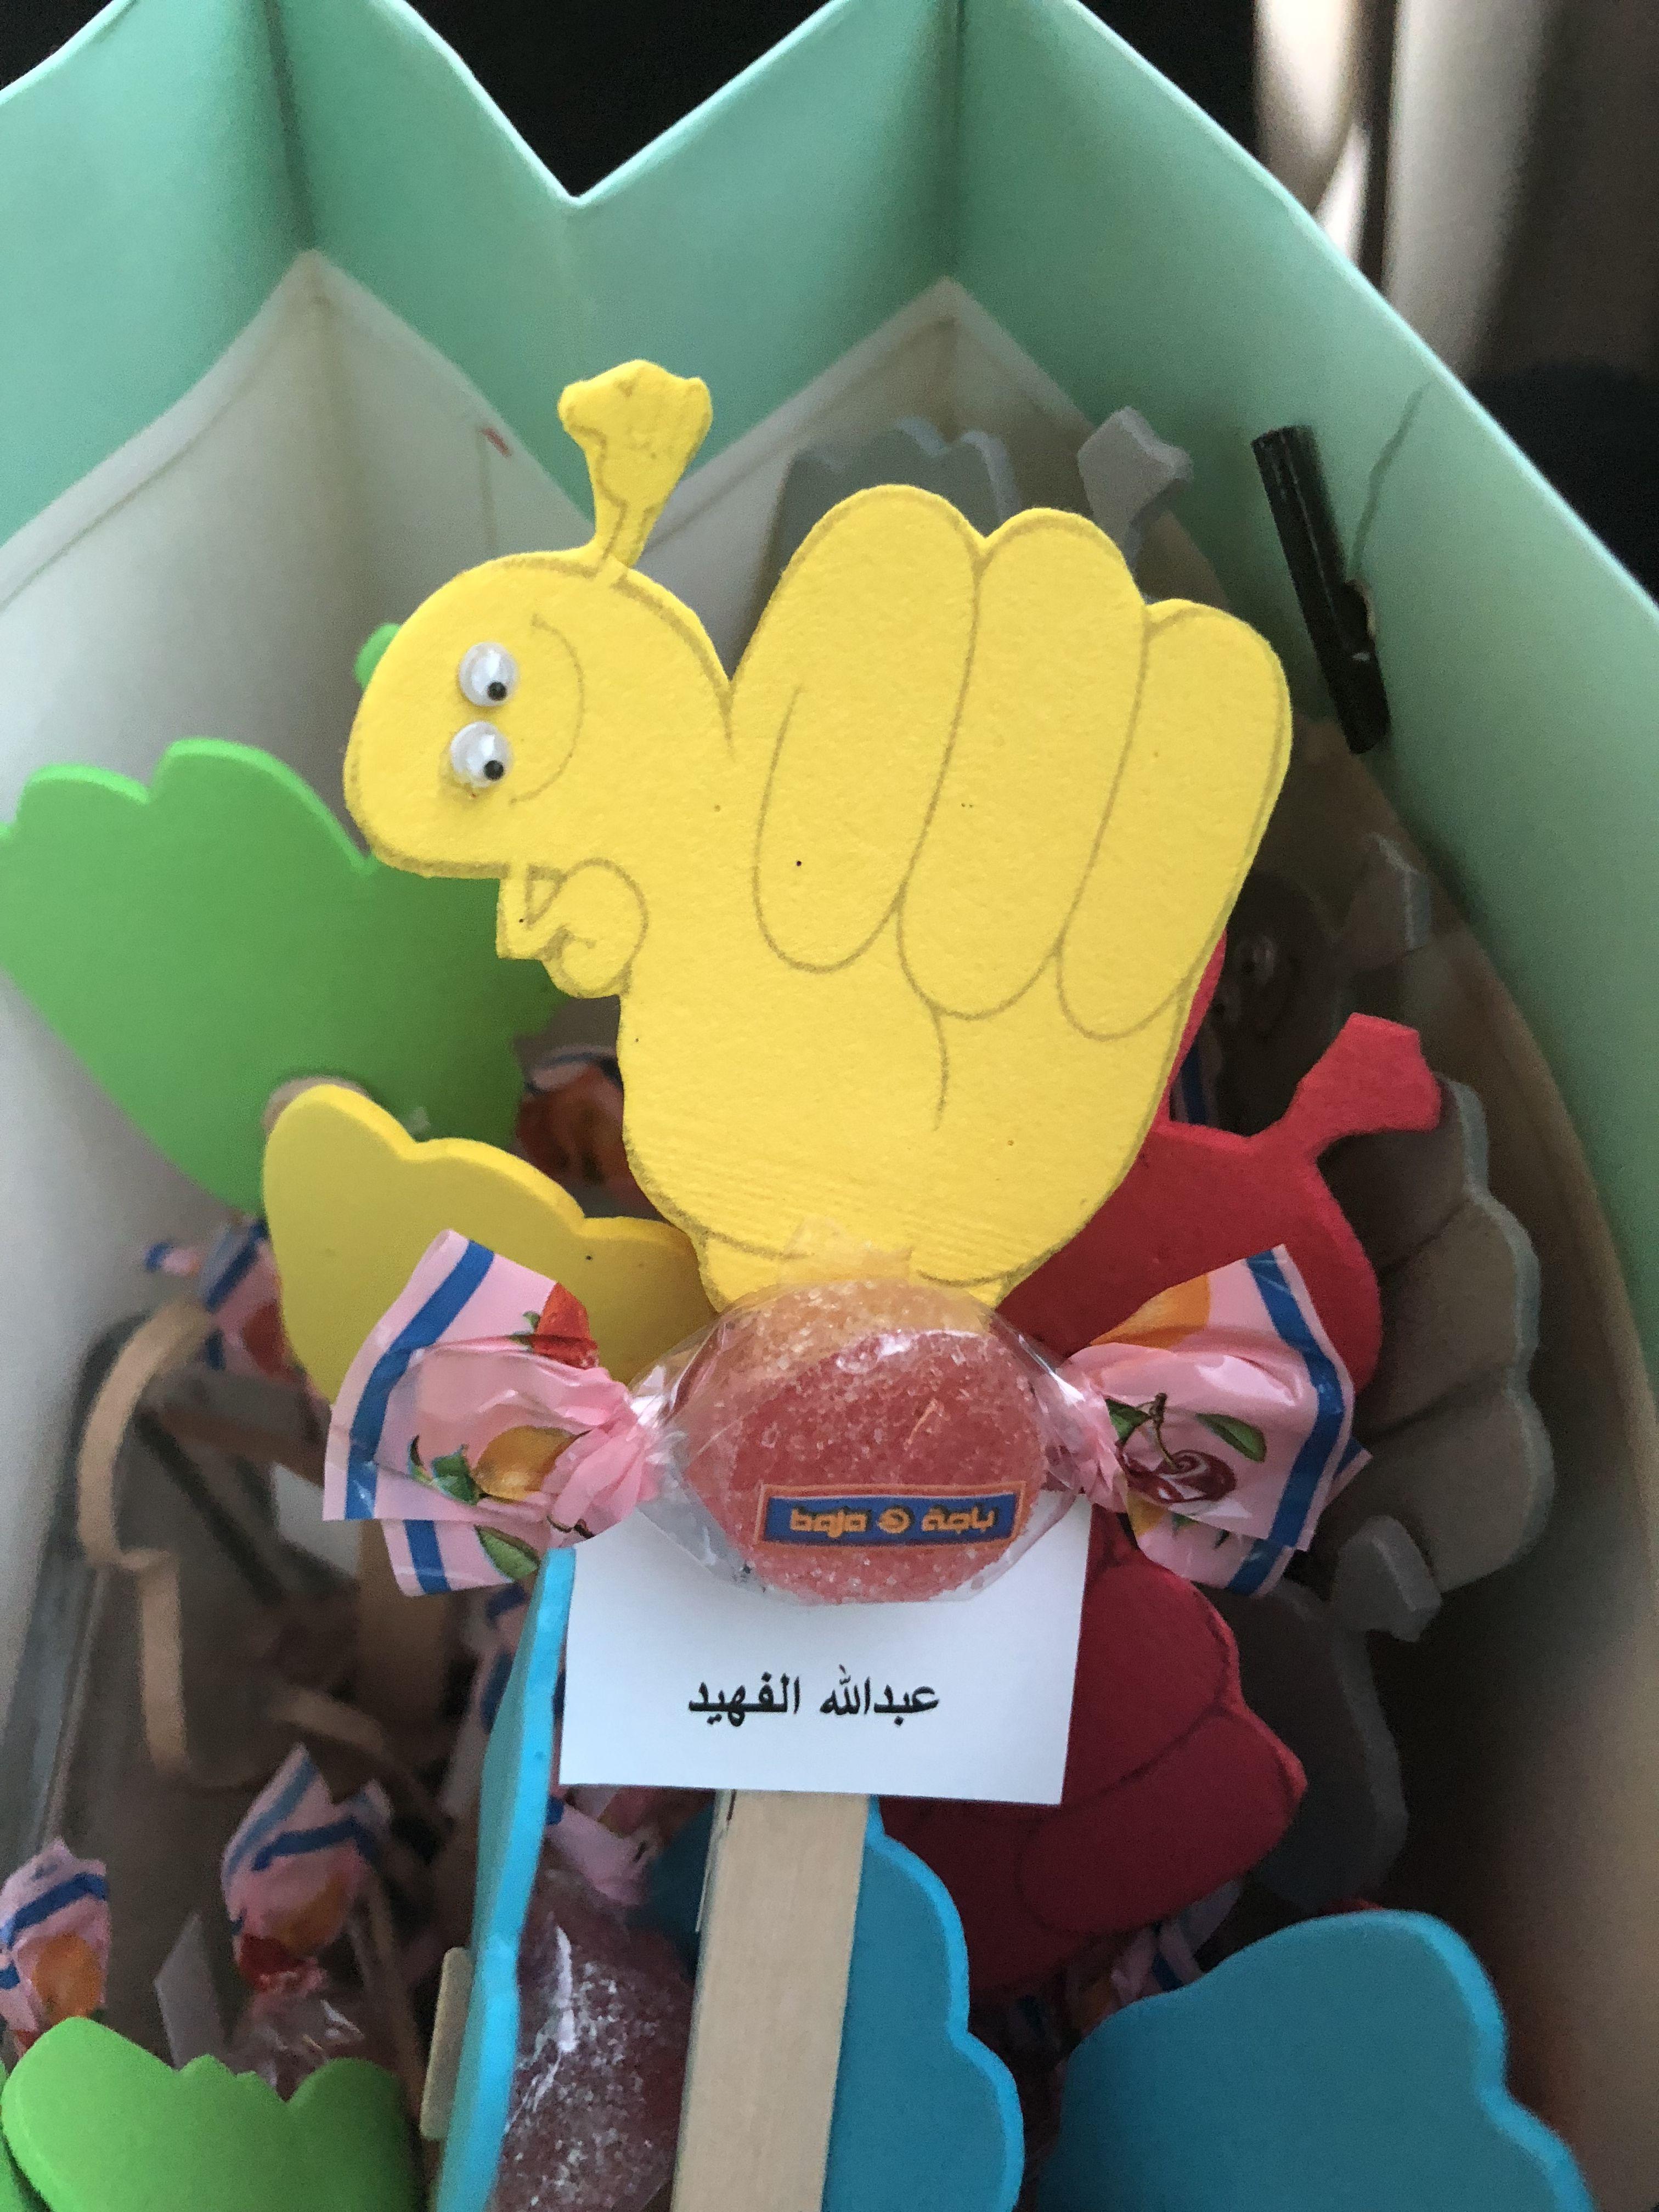 توزيعات رياض أطفال رياض أطفال هدايا توزيعات مدارس حروف حرف الياء حرف ي روضة اعمال فنية اعمال Candy Crafts Alphabet Coloring Pages Alphabet Coloring